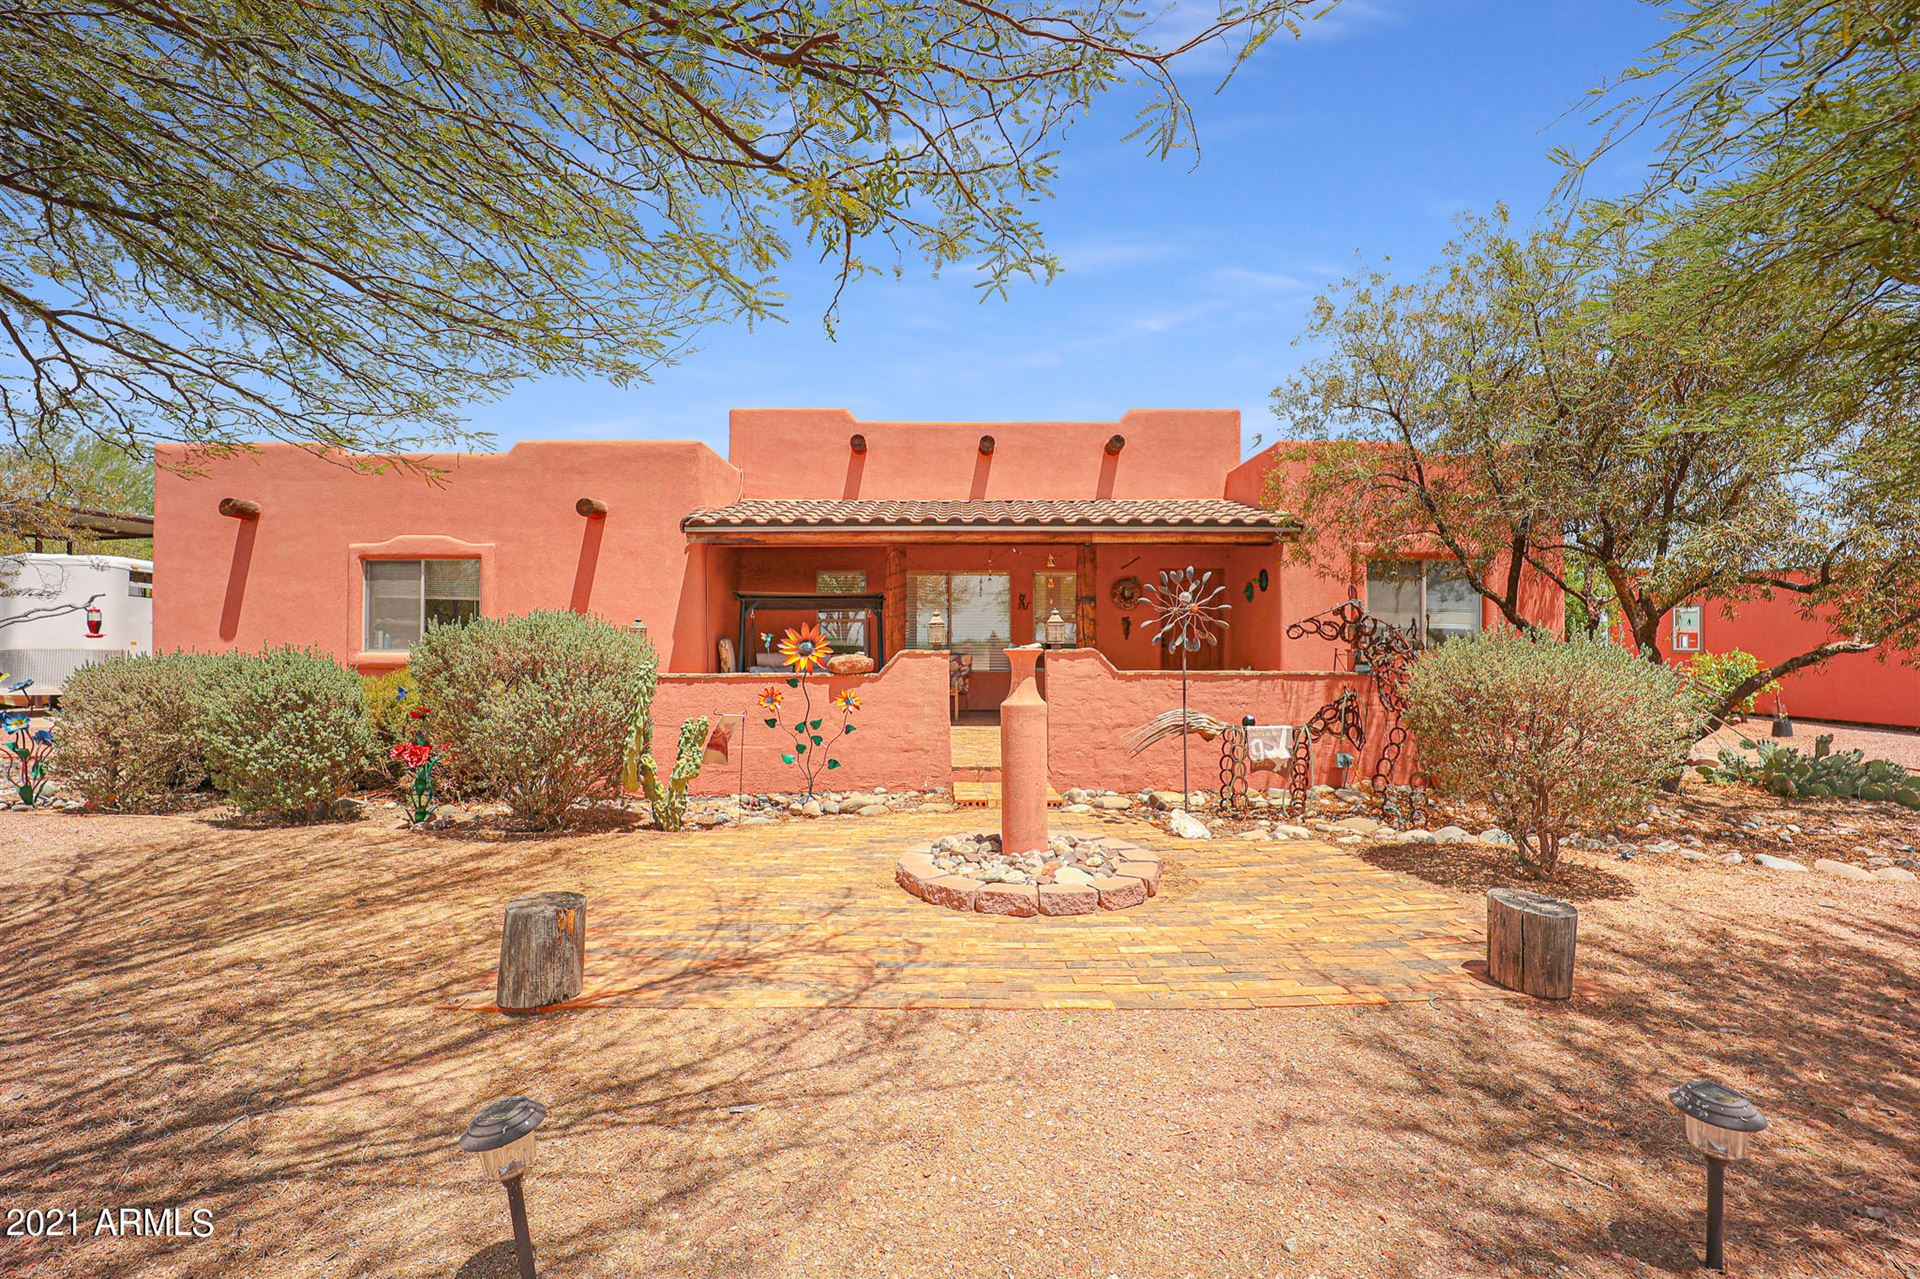 Photo of 30607 N 213th Drive, Wittmann, AZ 85361 (MLS # 6245660)